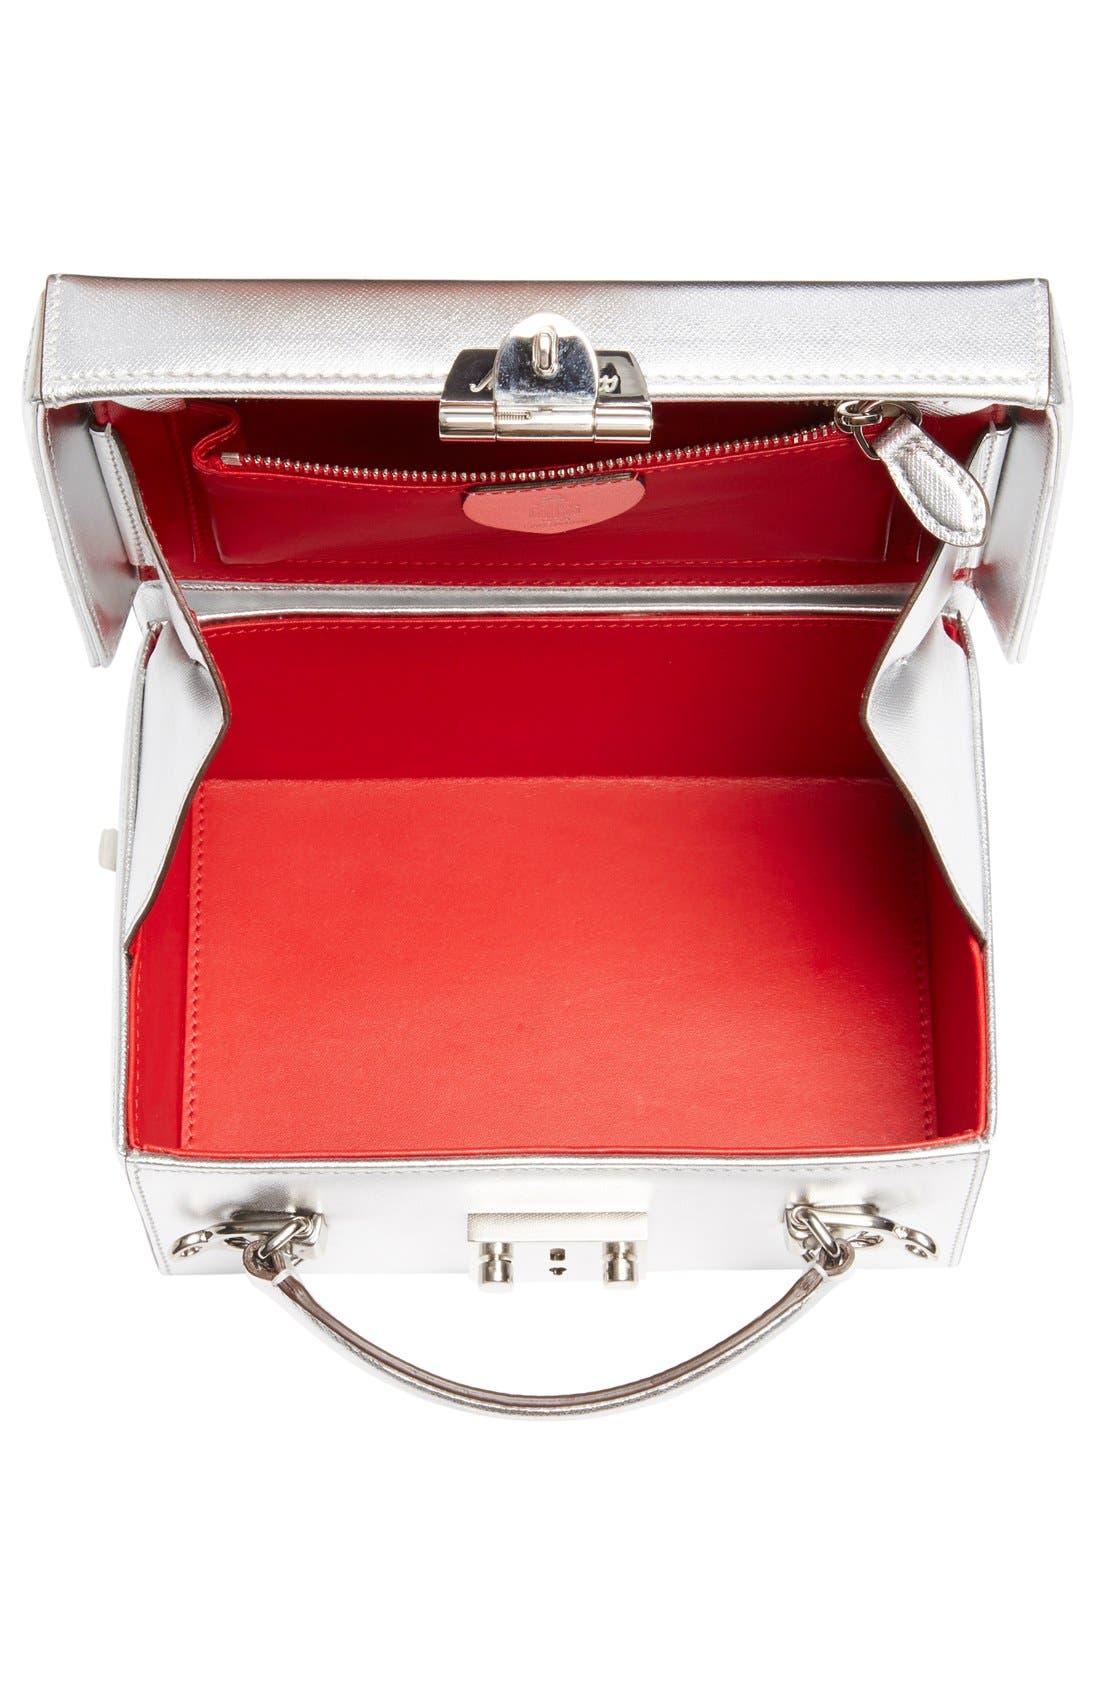 Alternate Image 3  - Mark Cross 'Small Grace' Metallic Saffiano Leather Box Clutch